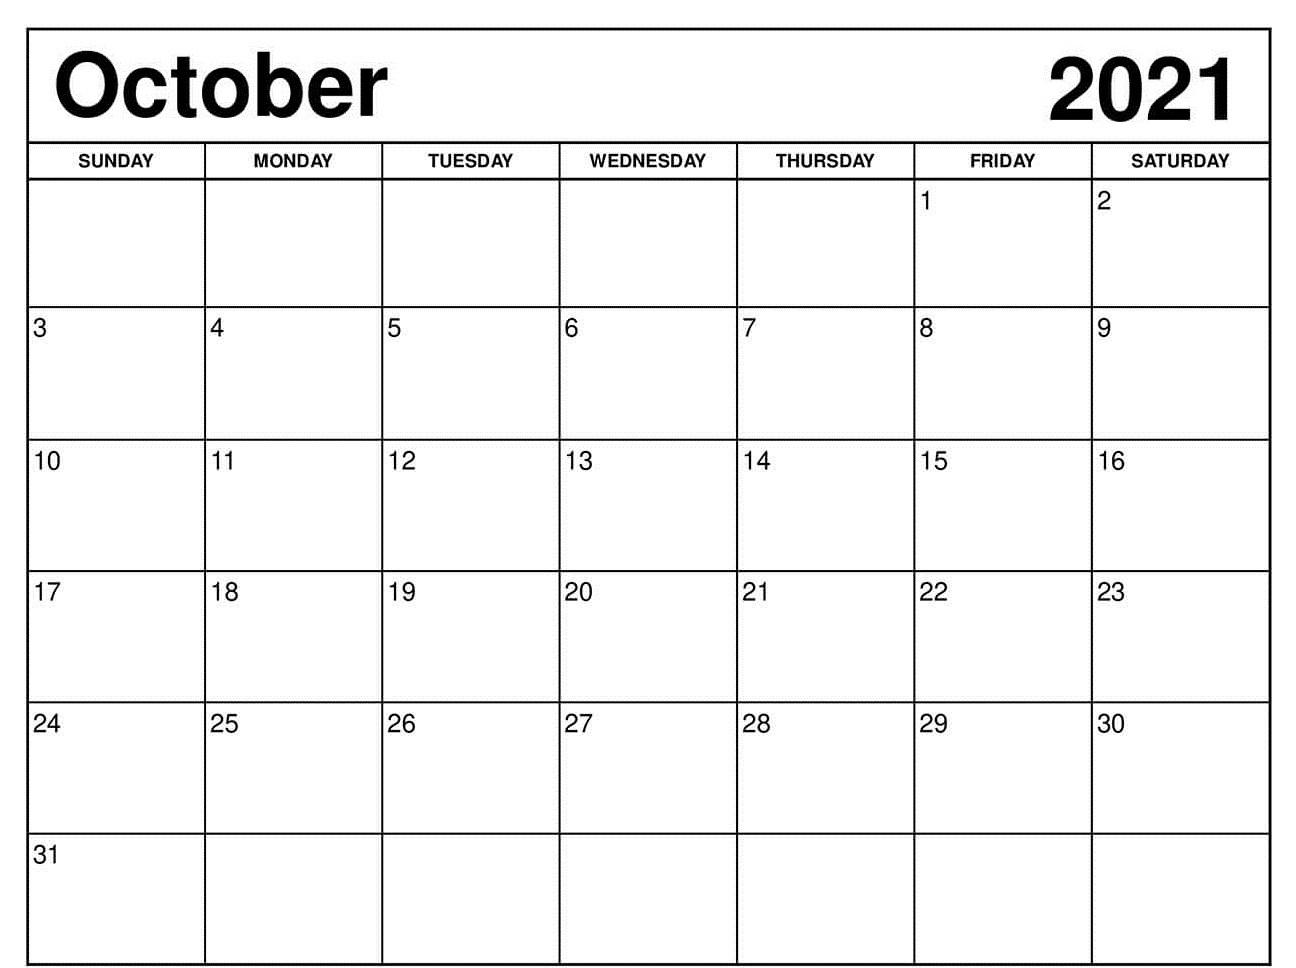 Daily October 2021 Calendar Template